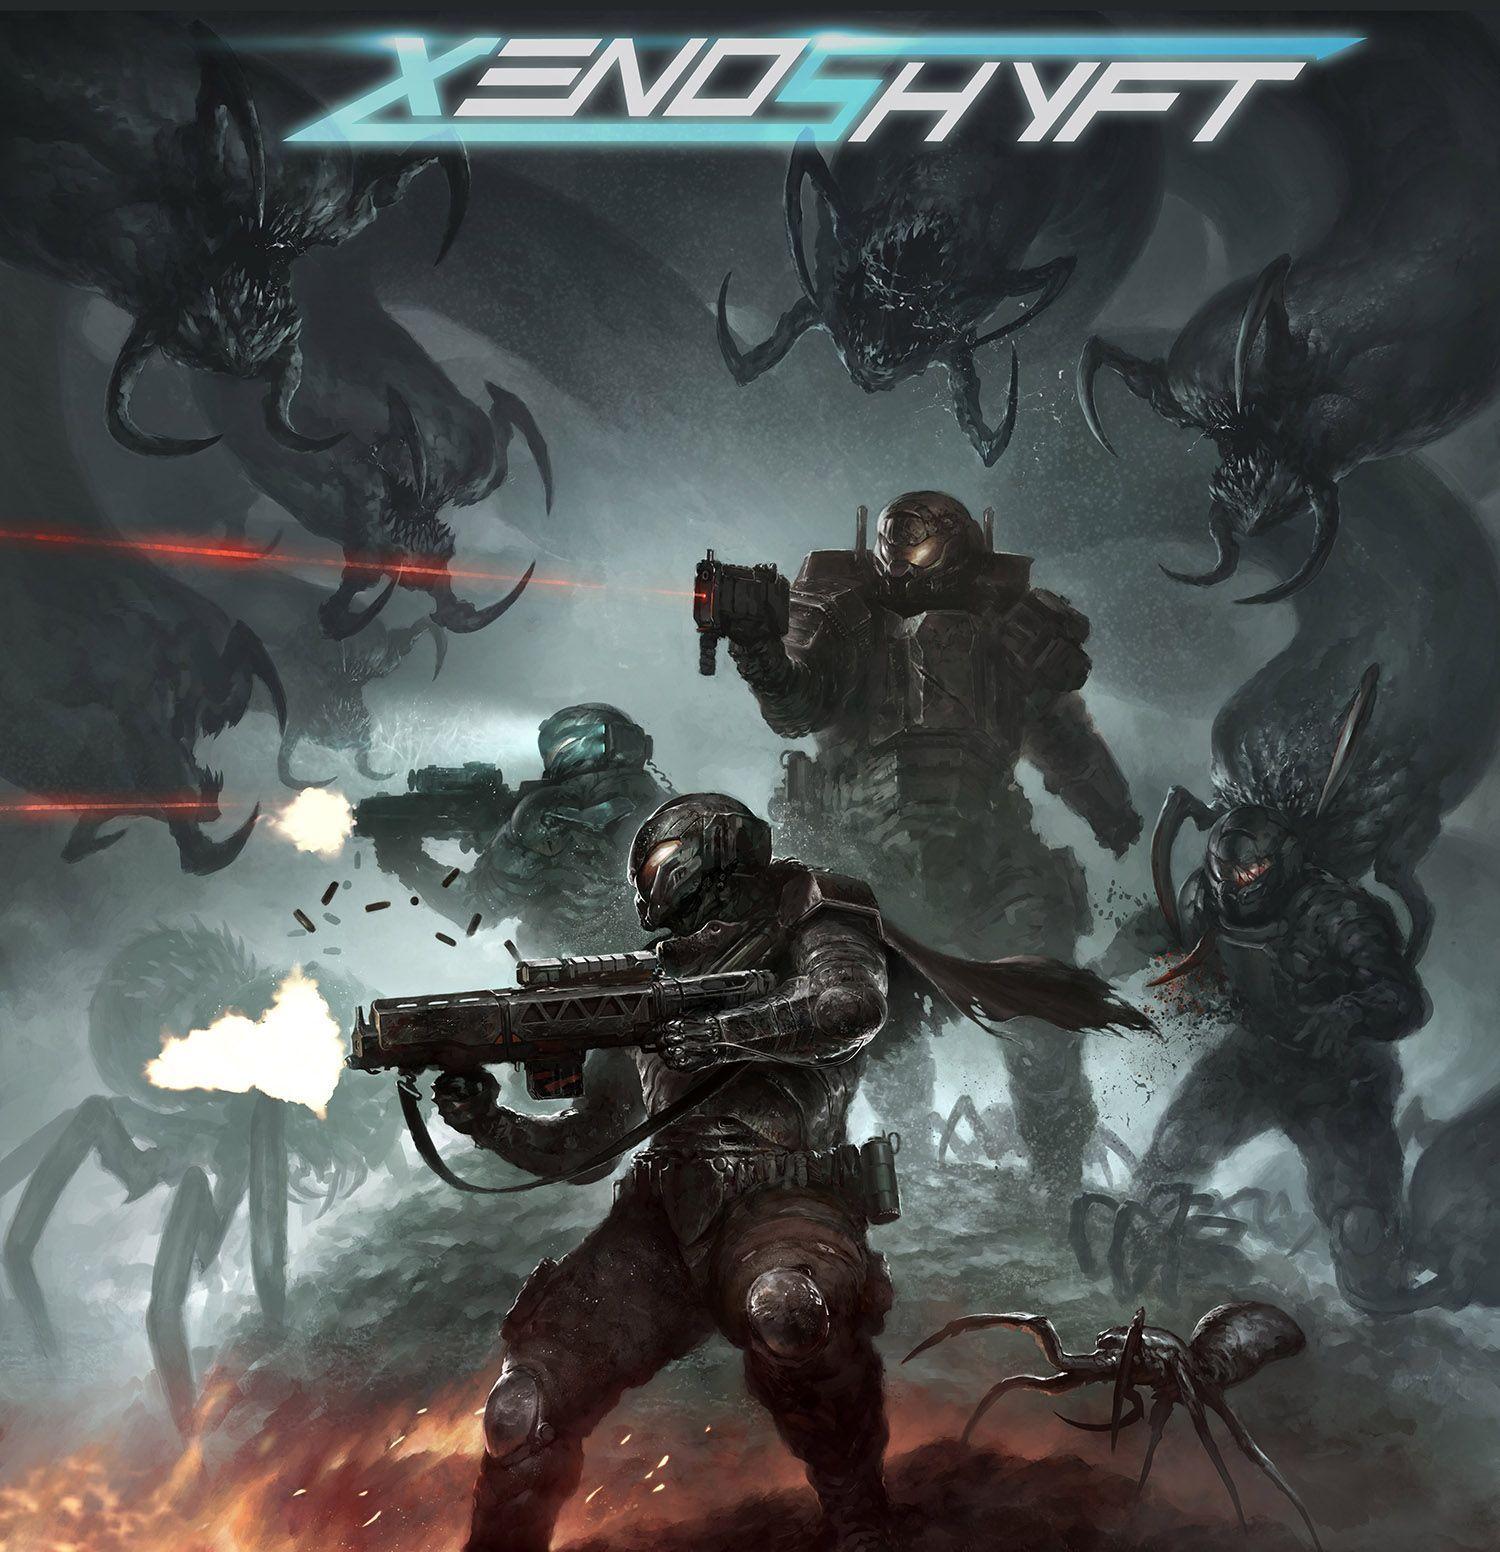 Main image for XenoShyft: Onslaught